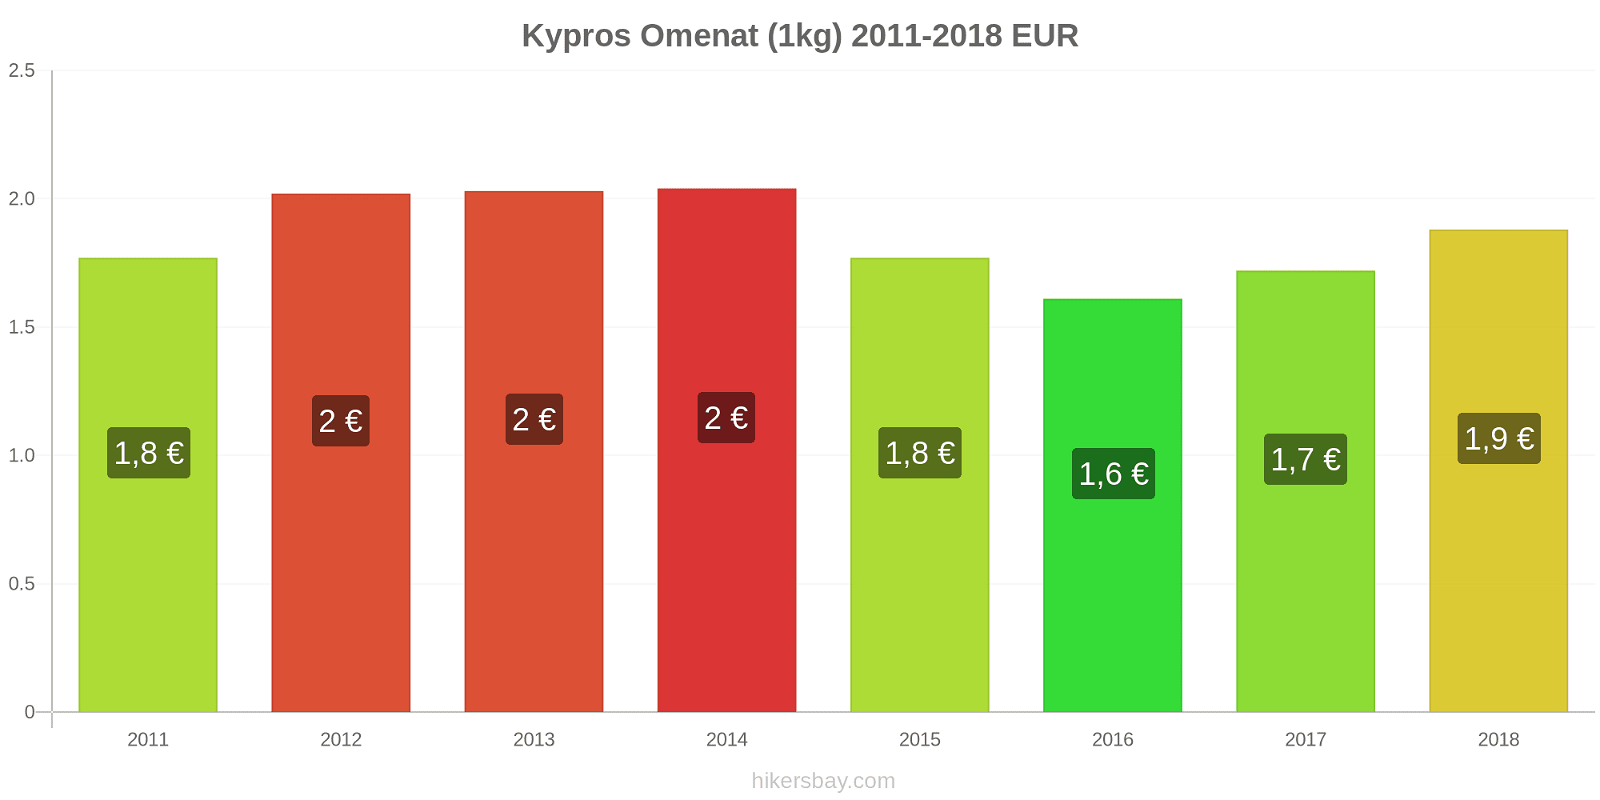 Kypros hintojen muutokset Omenat (1kg) hikersbay.com